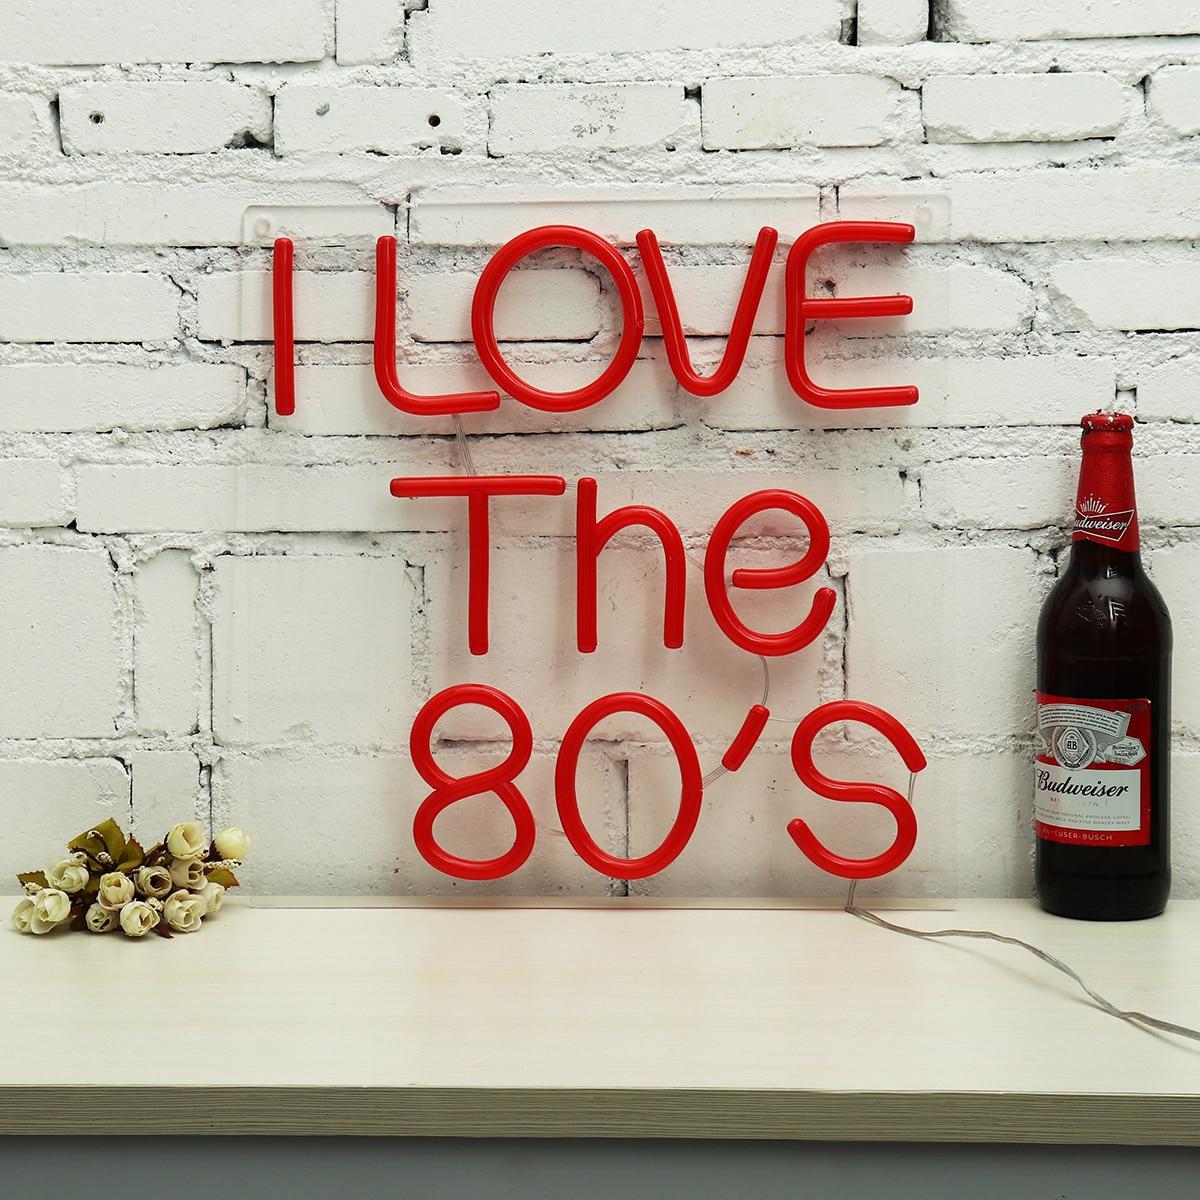 I Love The 80'S Neon Sign LED Lighting Tube Night Lamp Handmade Visual Artwork Bar Club Wall Light Decoration Red 40x40cm